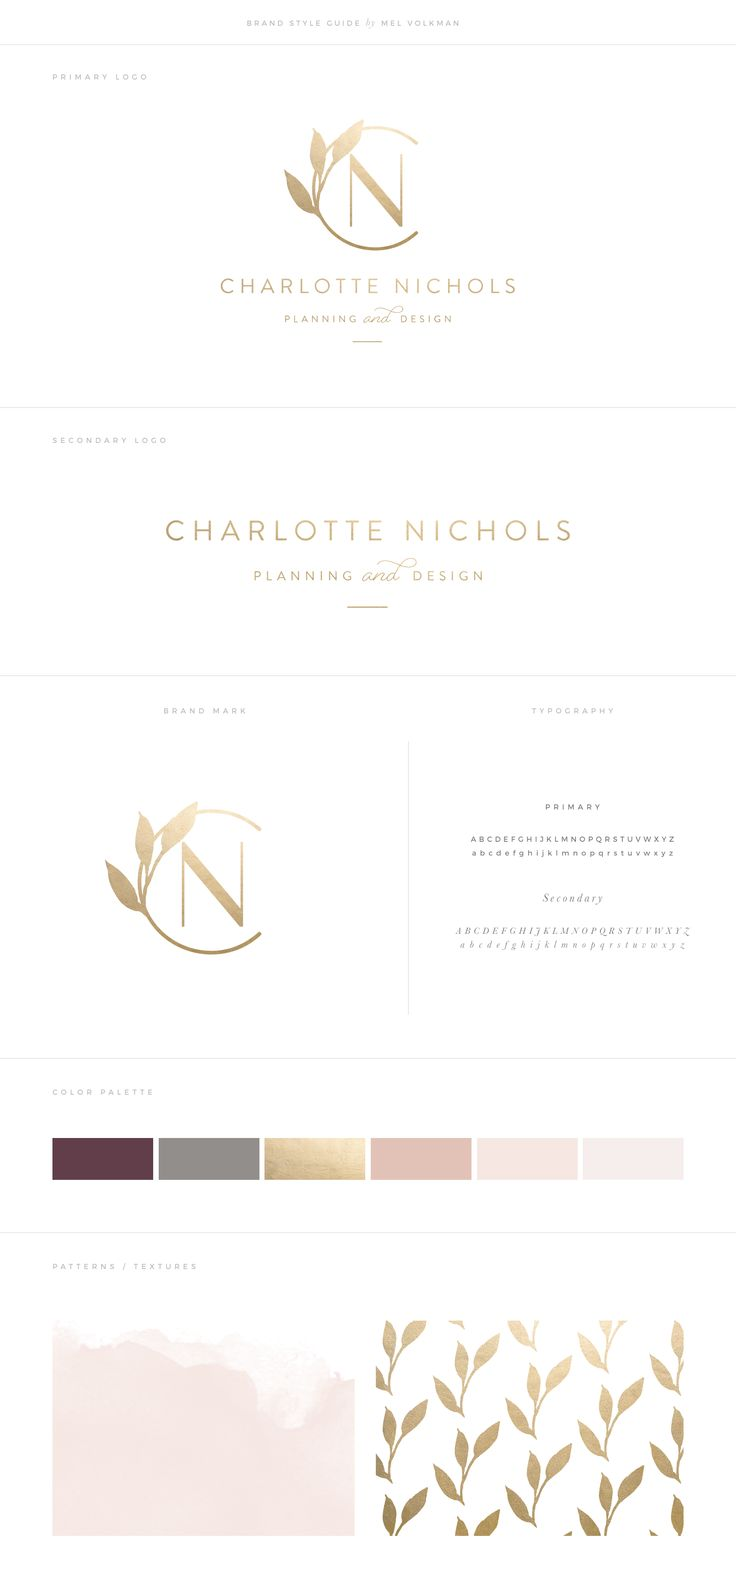 Charlotte Nichols Wedding Brand by Mel Volkman Gold Foil Elegant Branding Custom Logo Modern Logo Floral Botanical Modern Calligraphy Feminine Brand